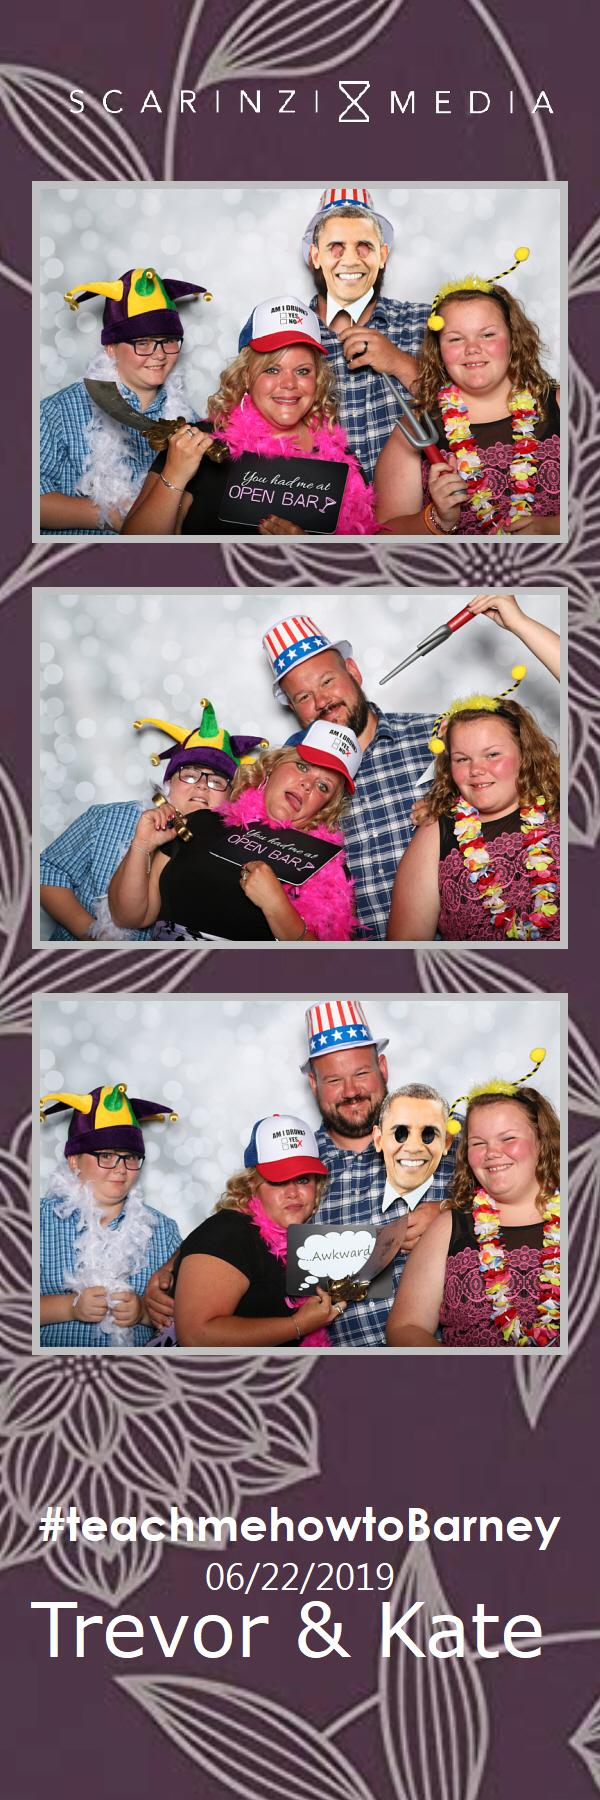 2019.06.22 - Barney Wedding PHOTOBOOTH32.jpg